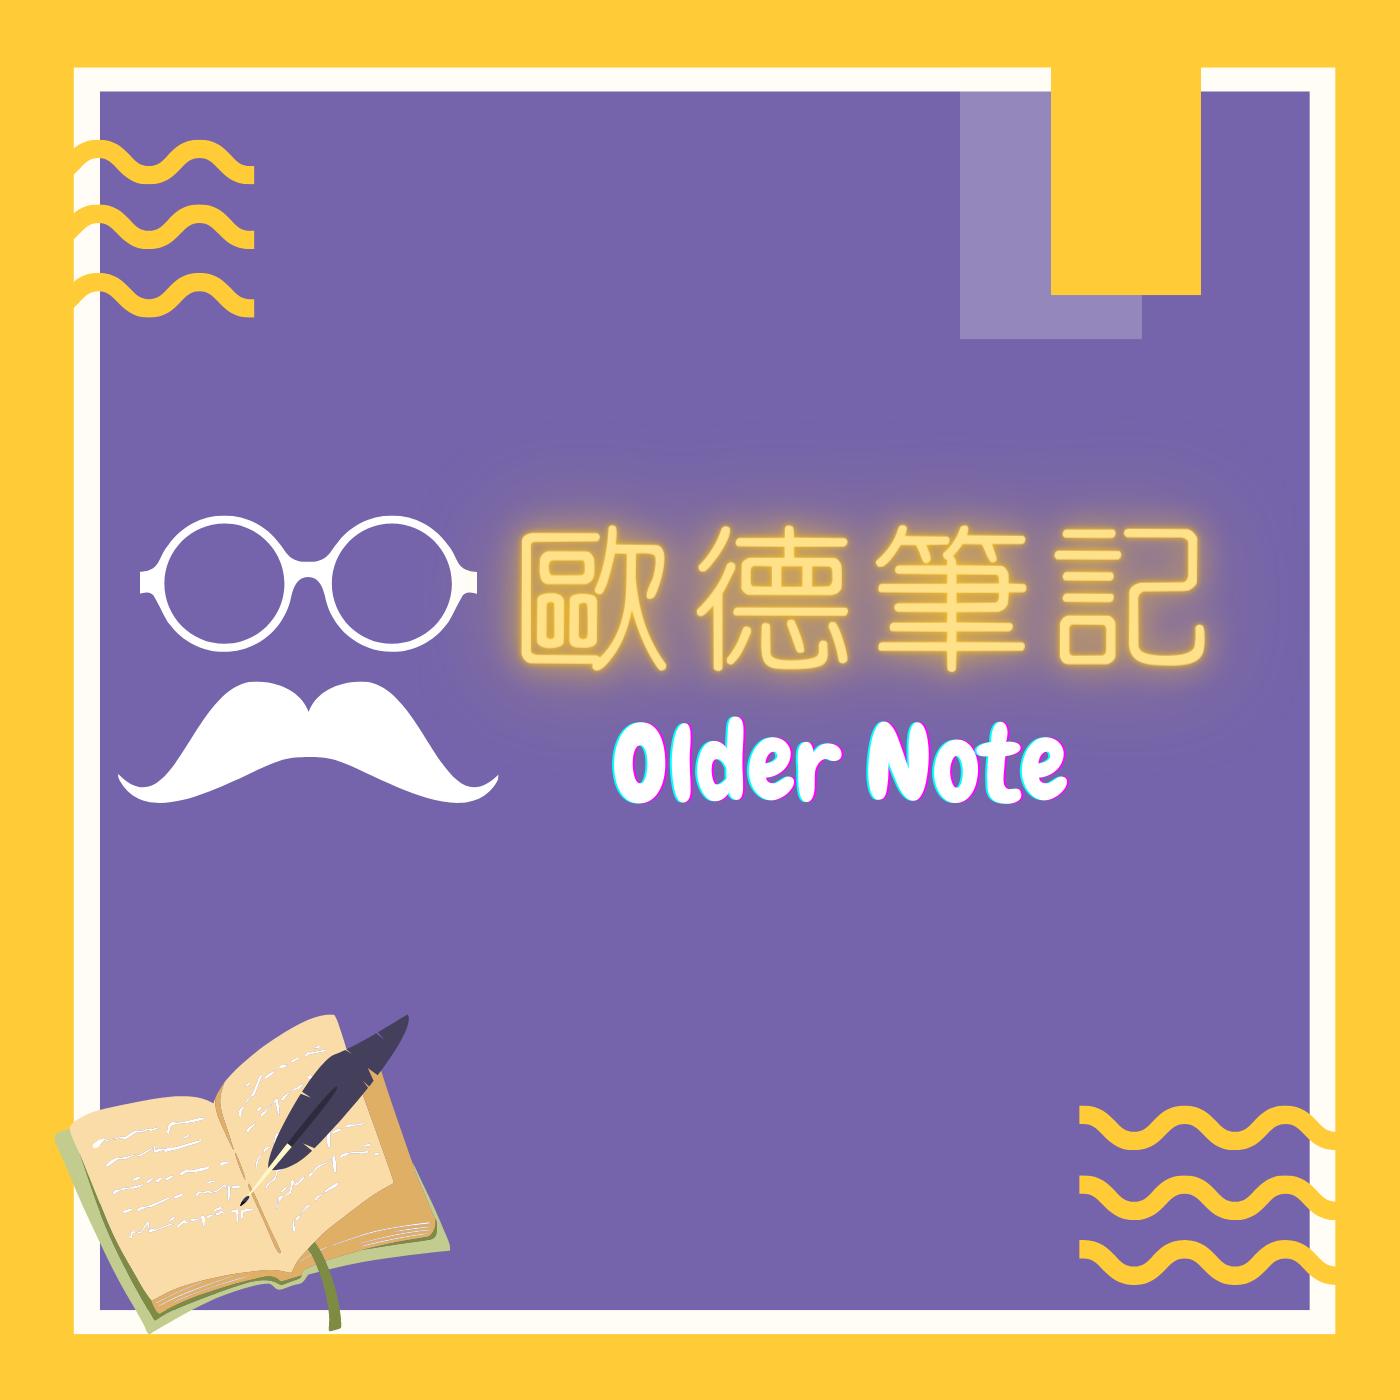 歐德筆記 older note